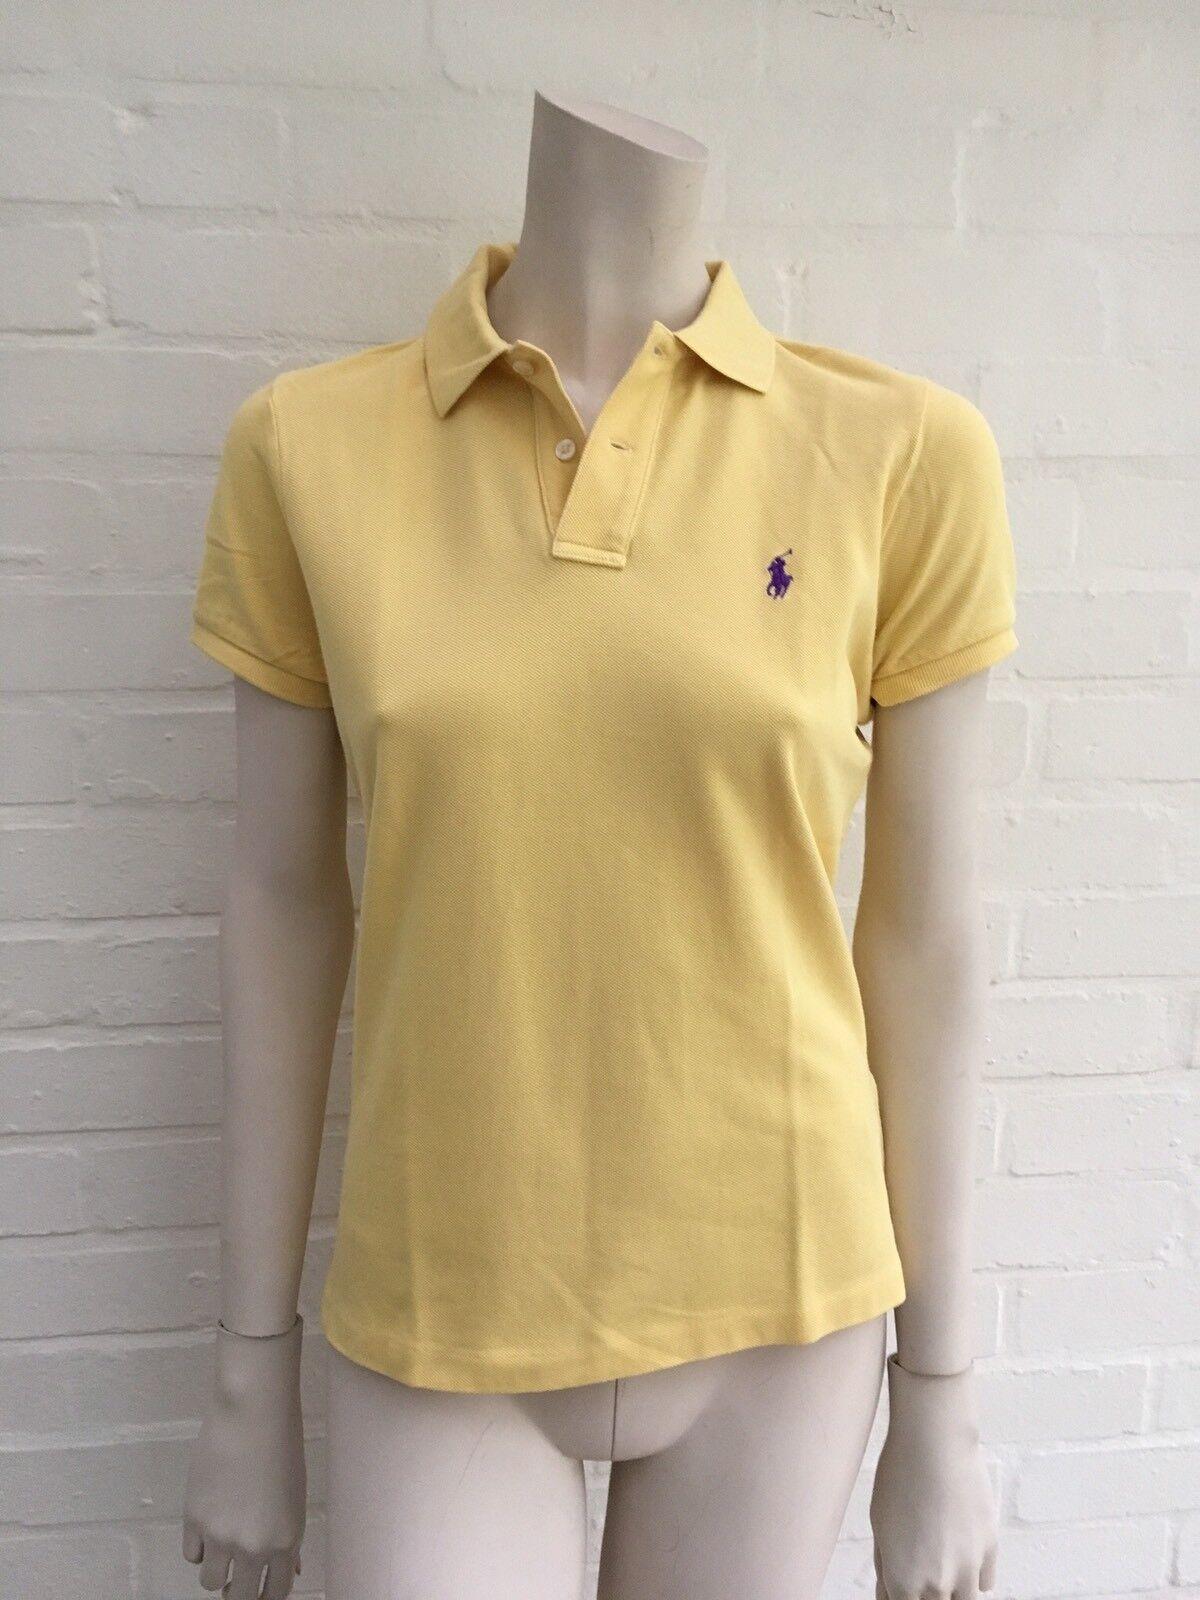 Ralph Lauren Polo The Skinny Polo Yellow T-shirt Top Size M medium